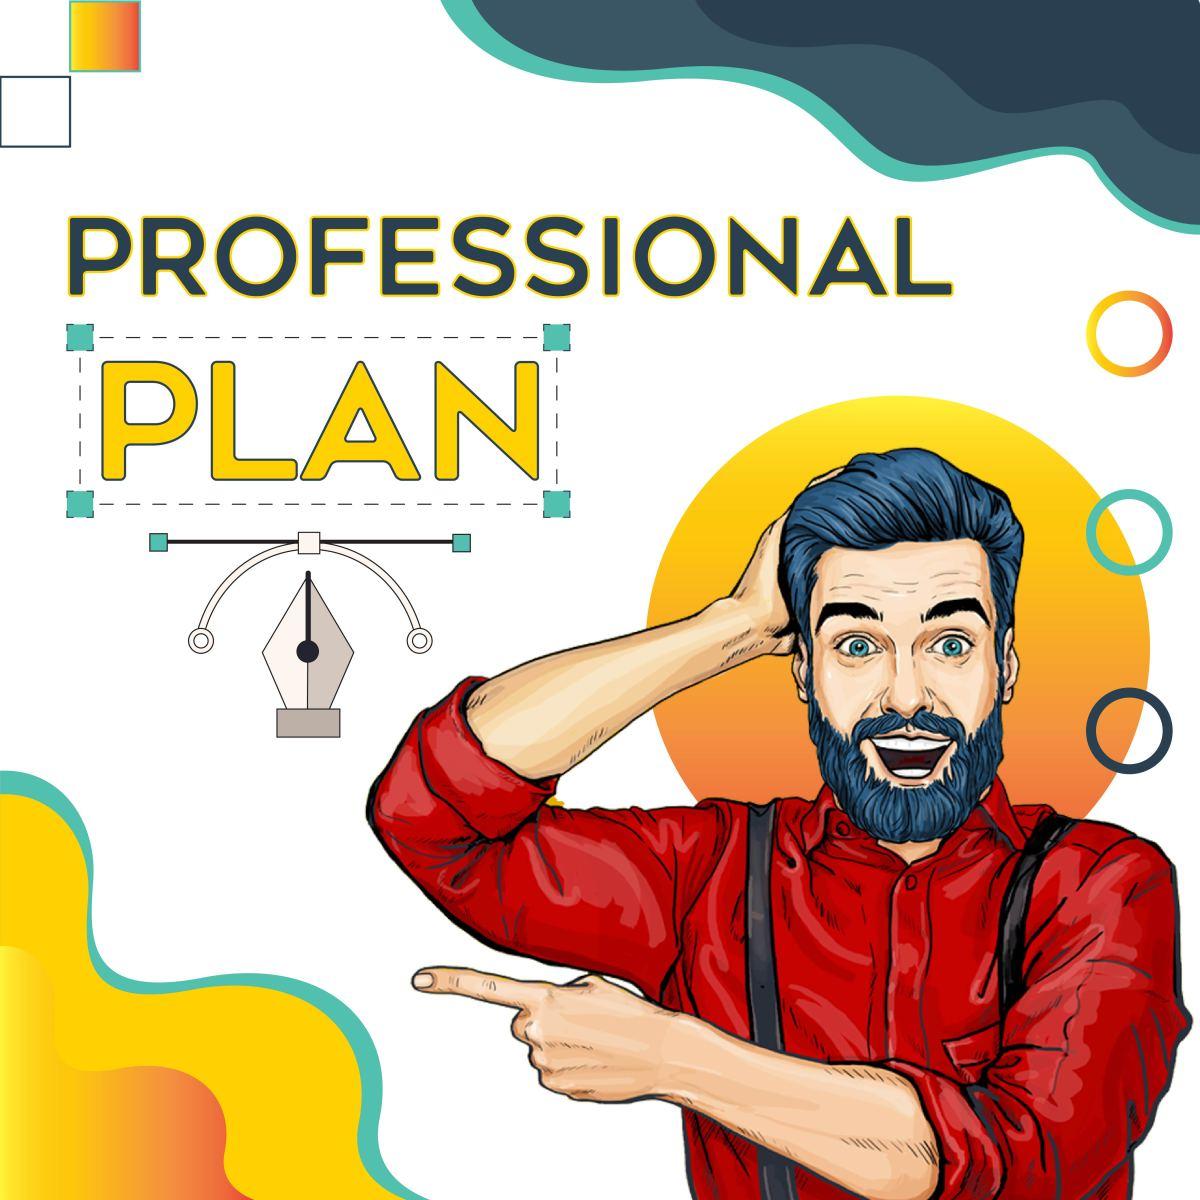 Professional plan